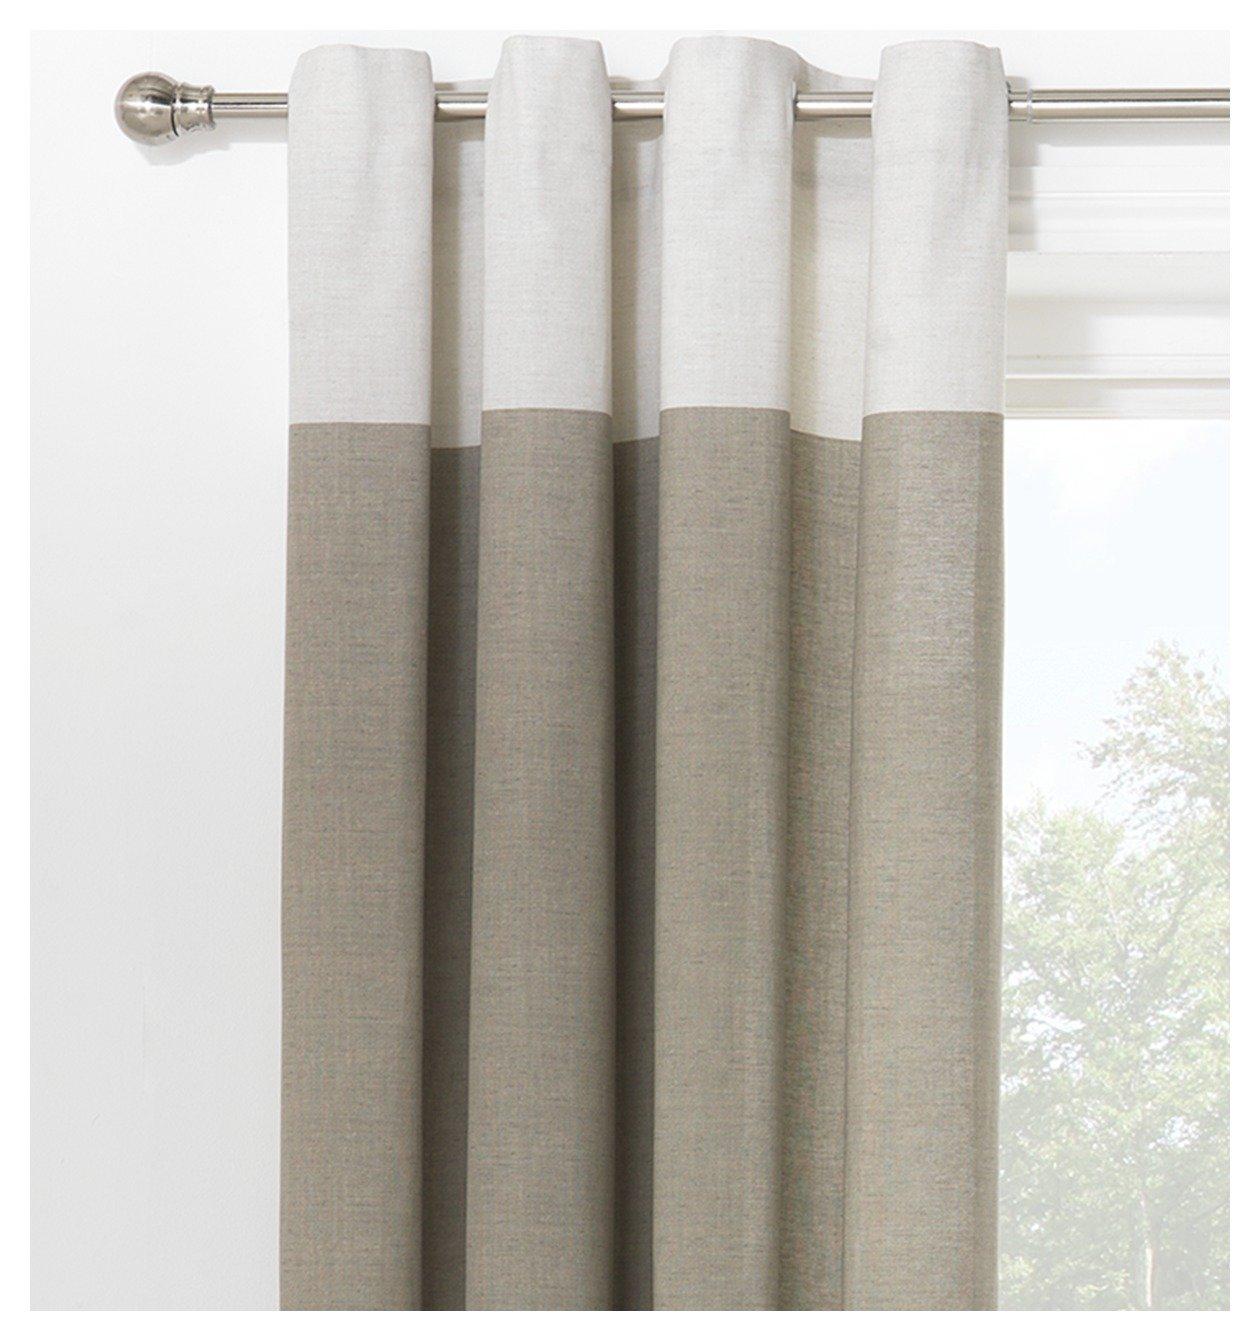 Argos Home Dublin Unlined Eyelet Curtains 168x183cm